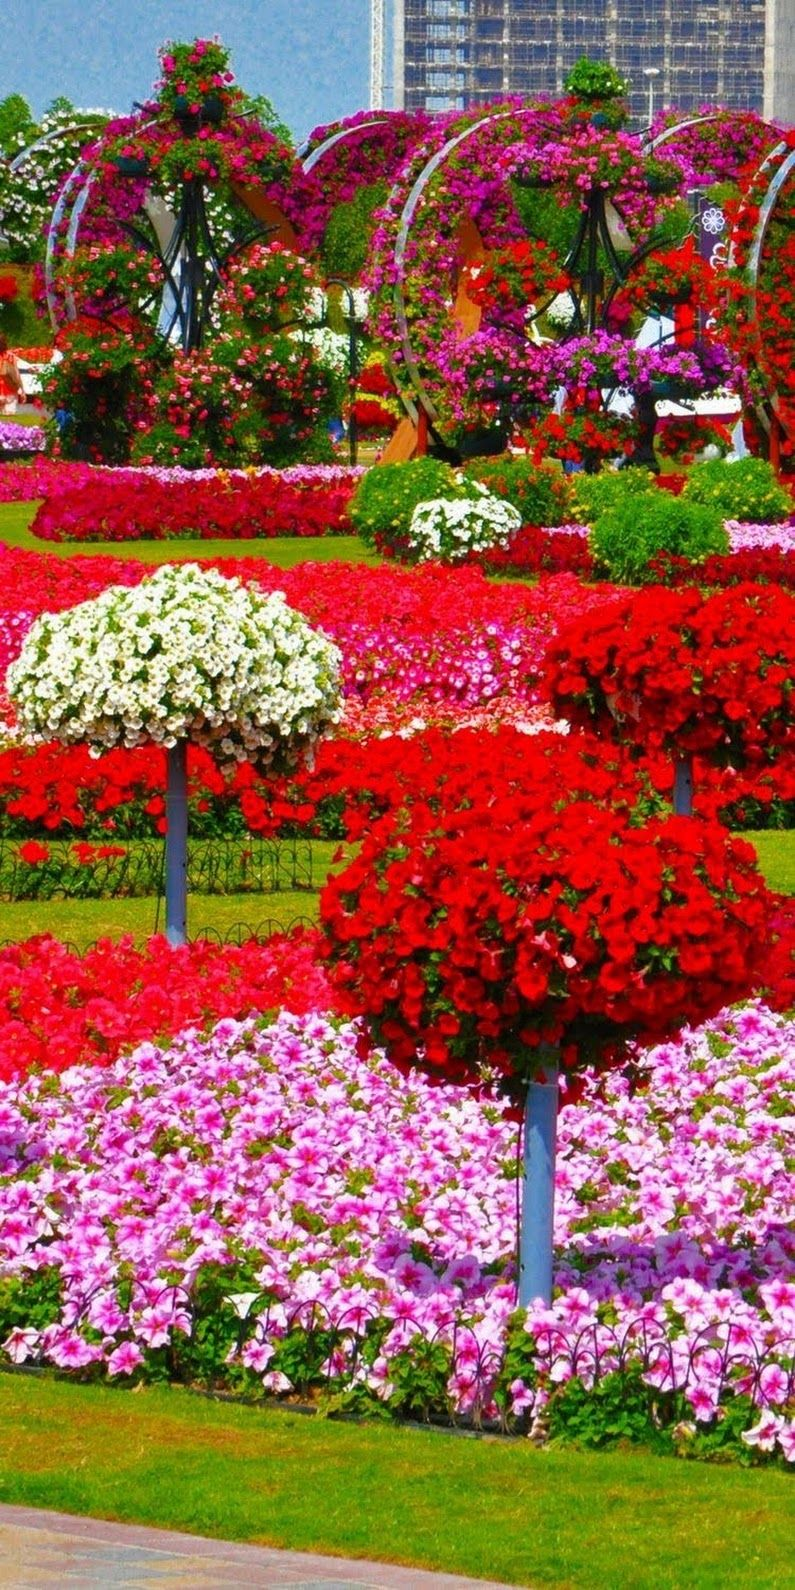 The Flower Garden (Bello)